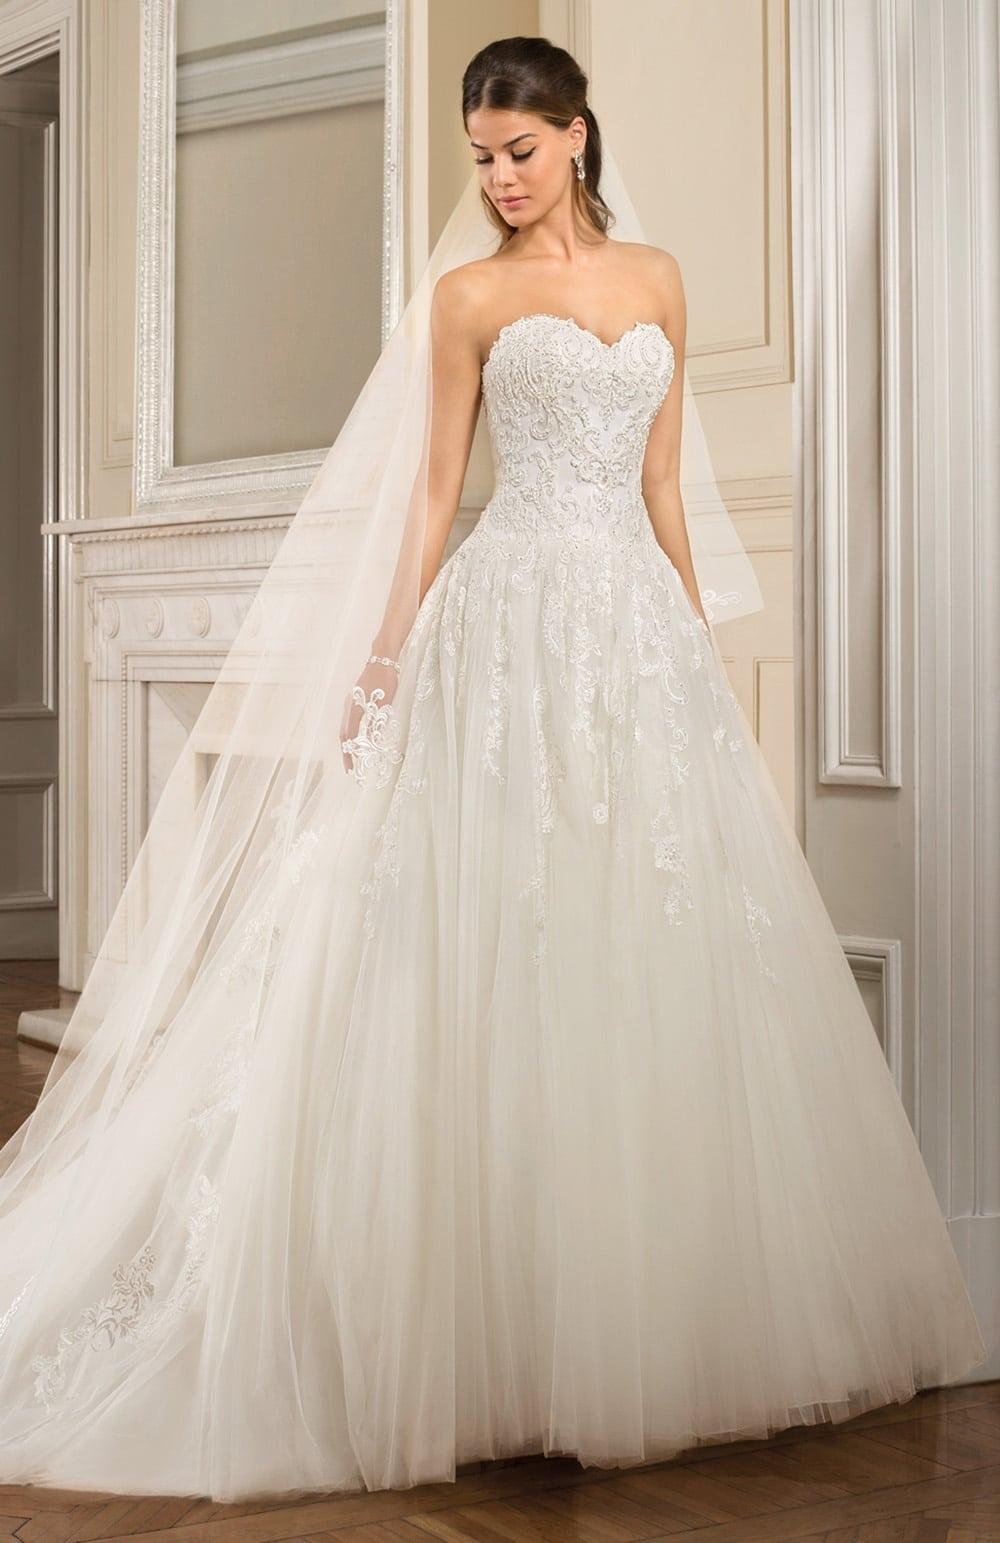 Robe de mariée Modèle Judy